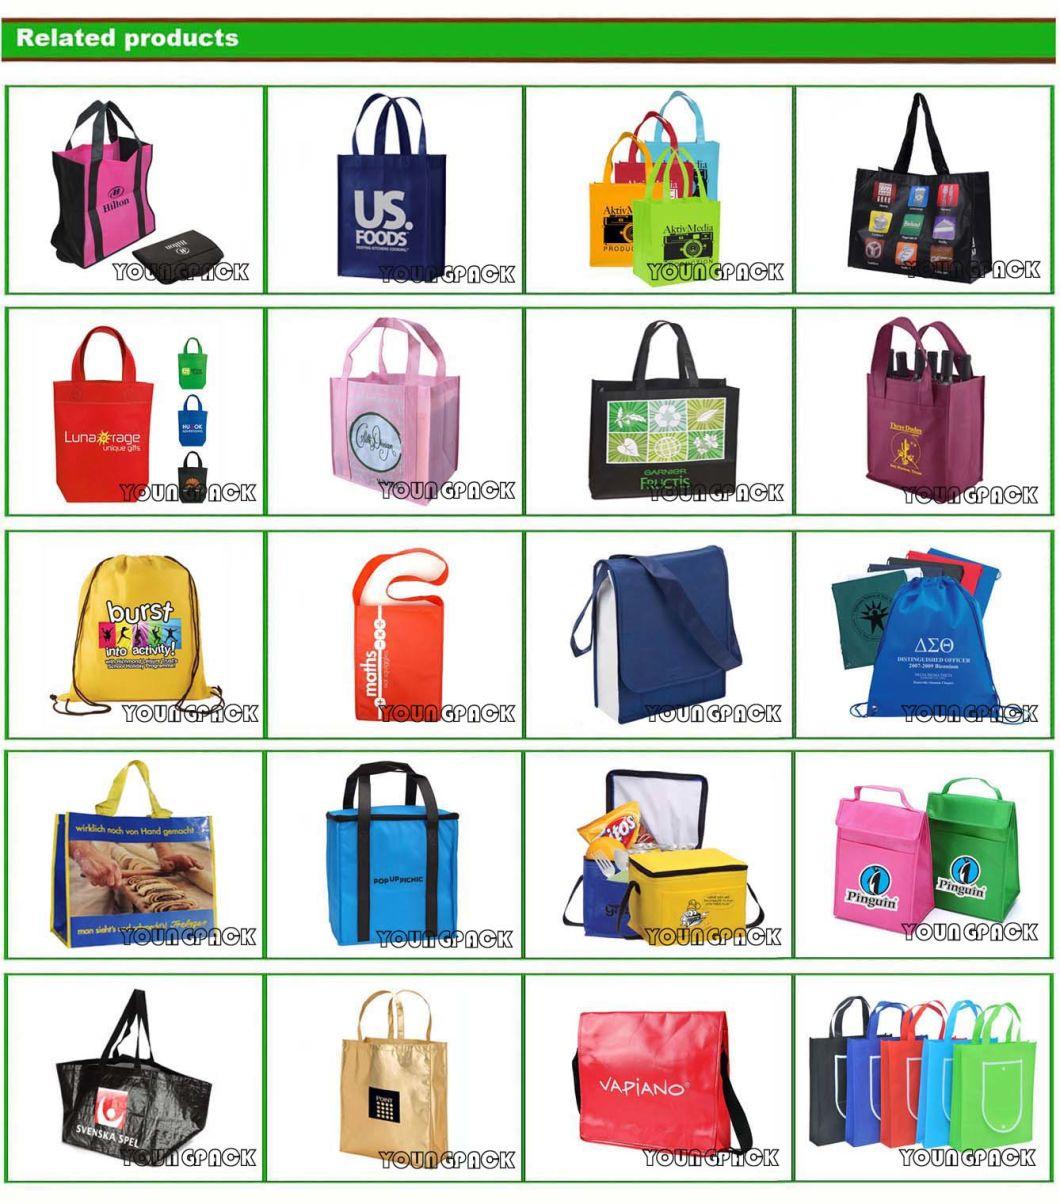 Wholesale Cheap Handbag Eco Friendly Reusable Supermarket Grocery Shopper Carry Bag Promotio<em></em>nal Gift Custom Printed Non-Woven Fabric Foldable Tote Shopping Bags